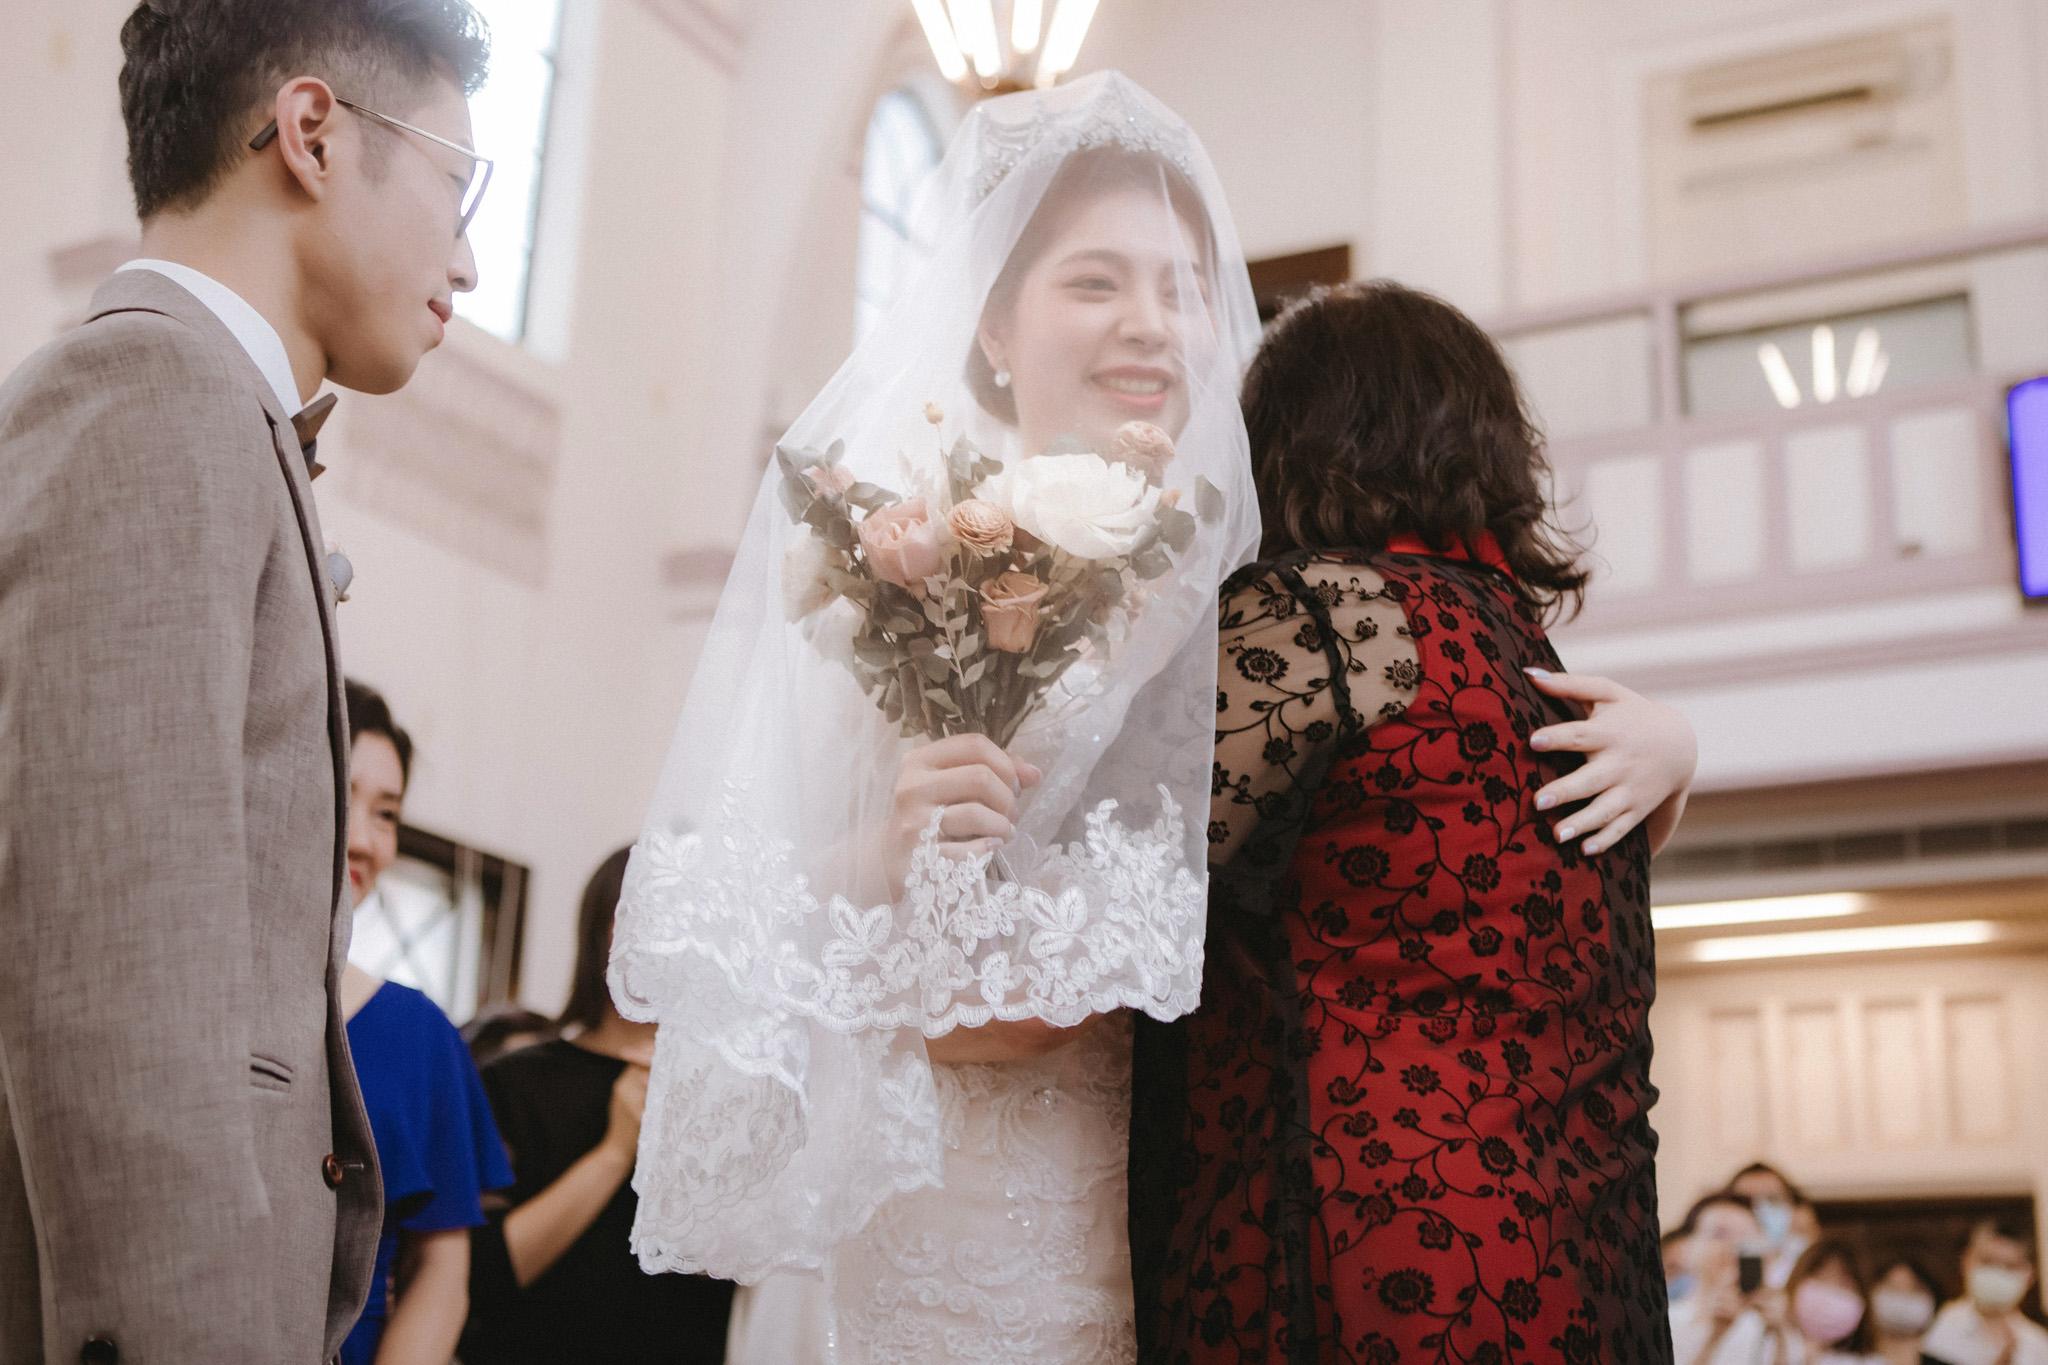 EW 台北婚攝 居米 濟南教會 Brick Yard 33 美軍俱樂部 婚禮 婚宴-27